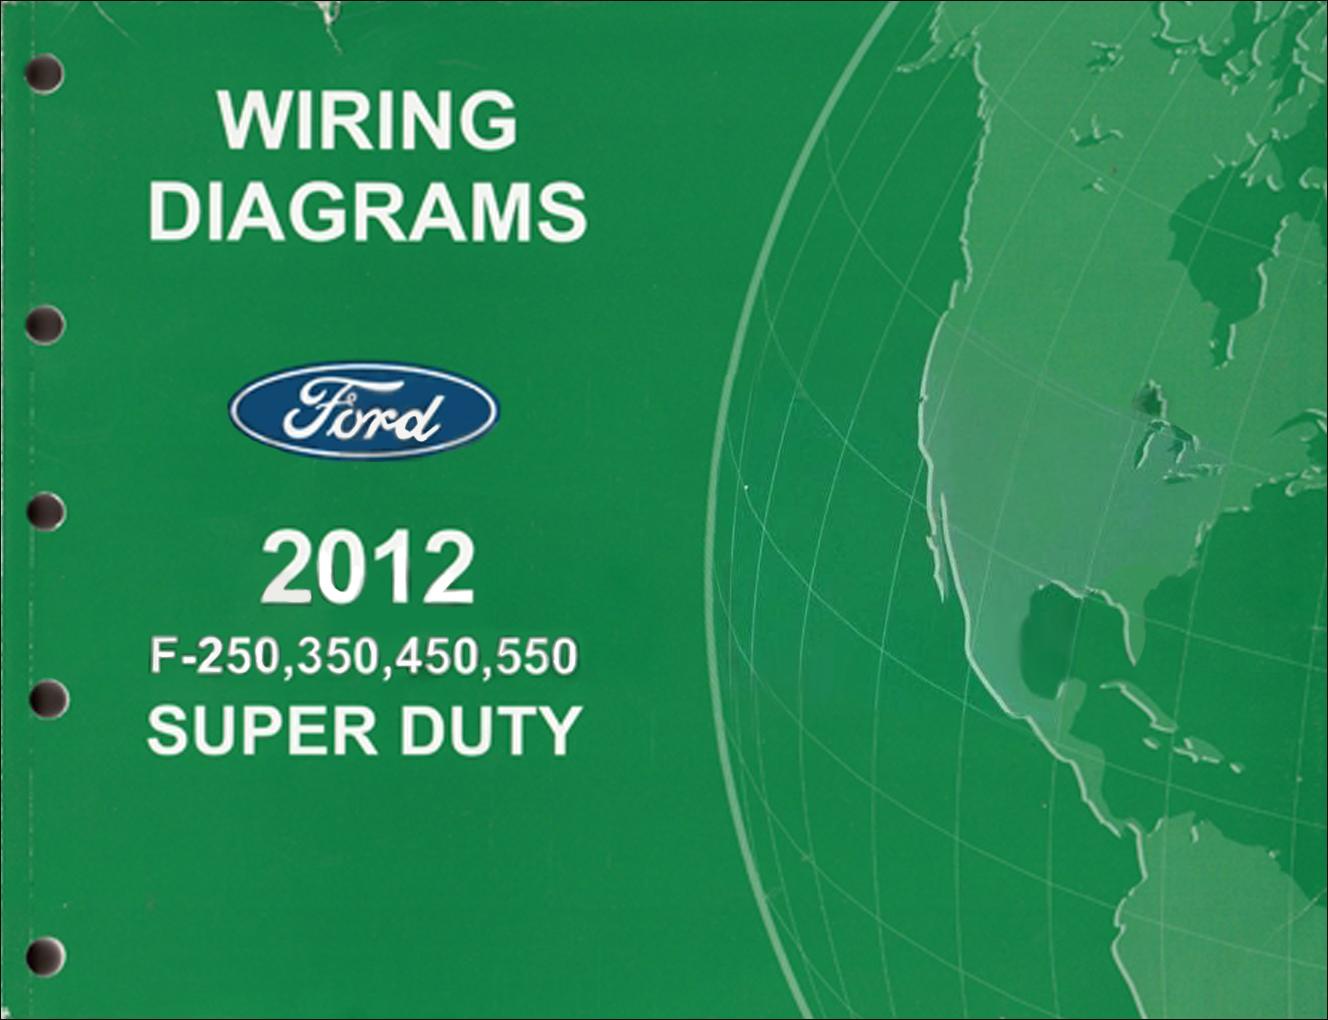 Outstanding 2012 Ford F 250 Thru 550 Super Duty Wiring Diagram Manual Original Wiring Cloud Licukaidewilluminateatxorg